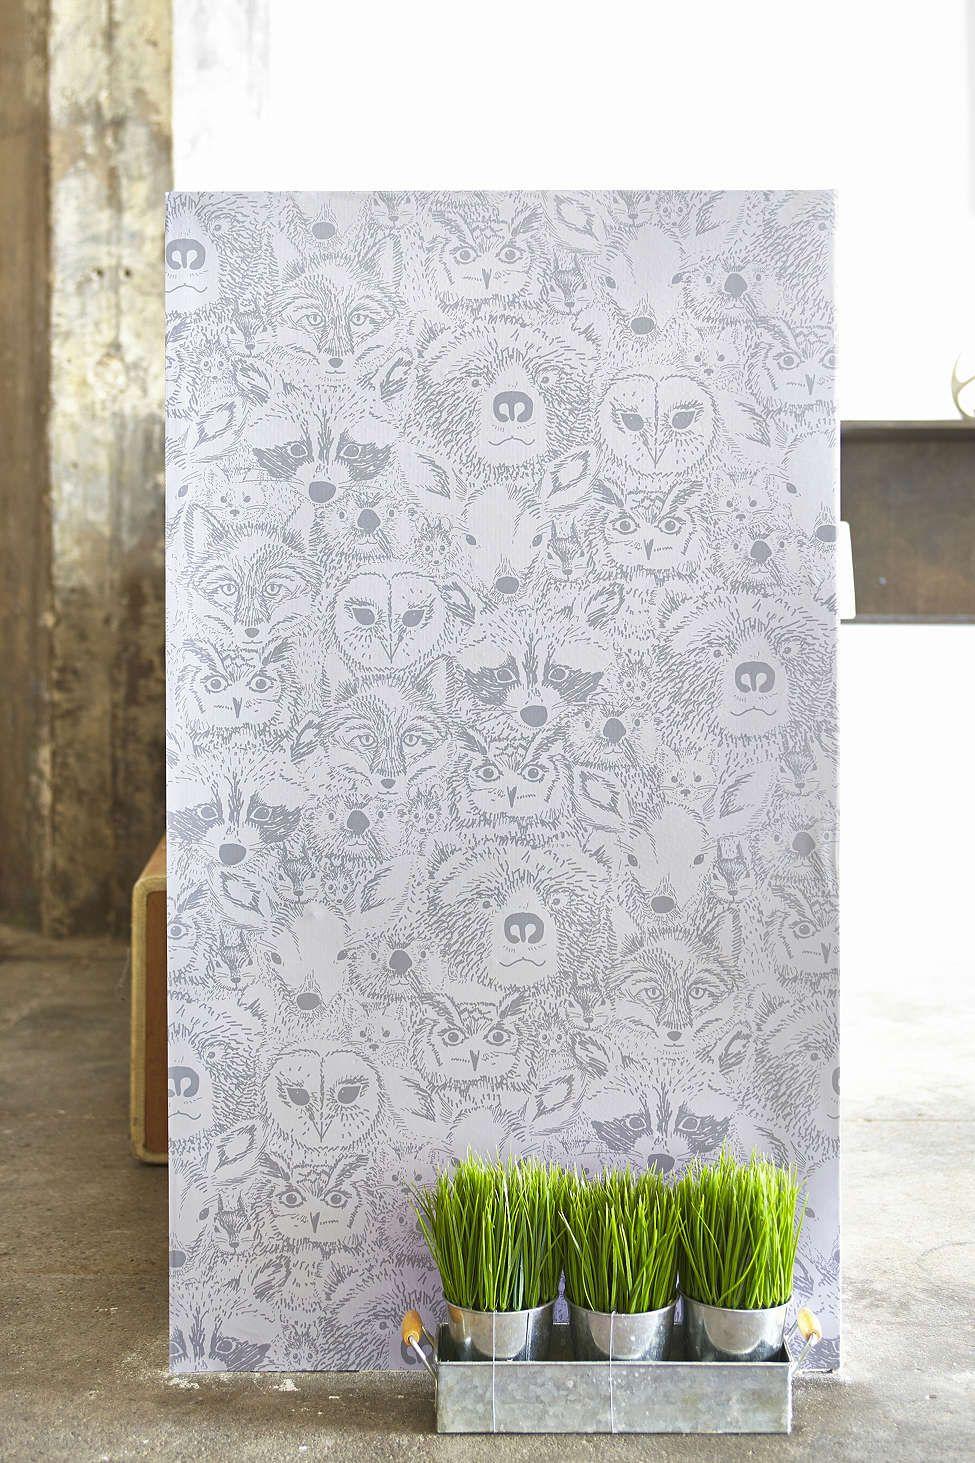 bloomingdale hang out art room chasing paper wild. Black Bedroom Furniture Sets. Home Design Ideas